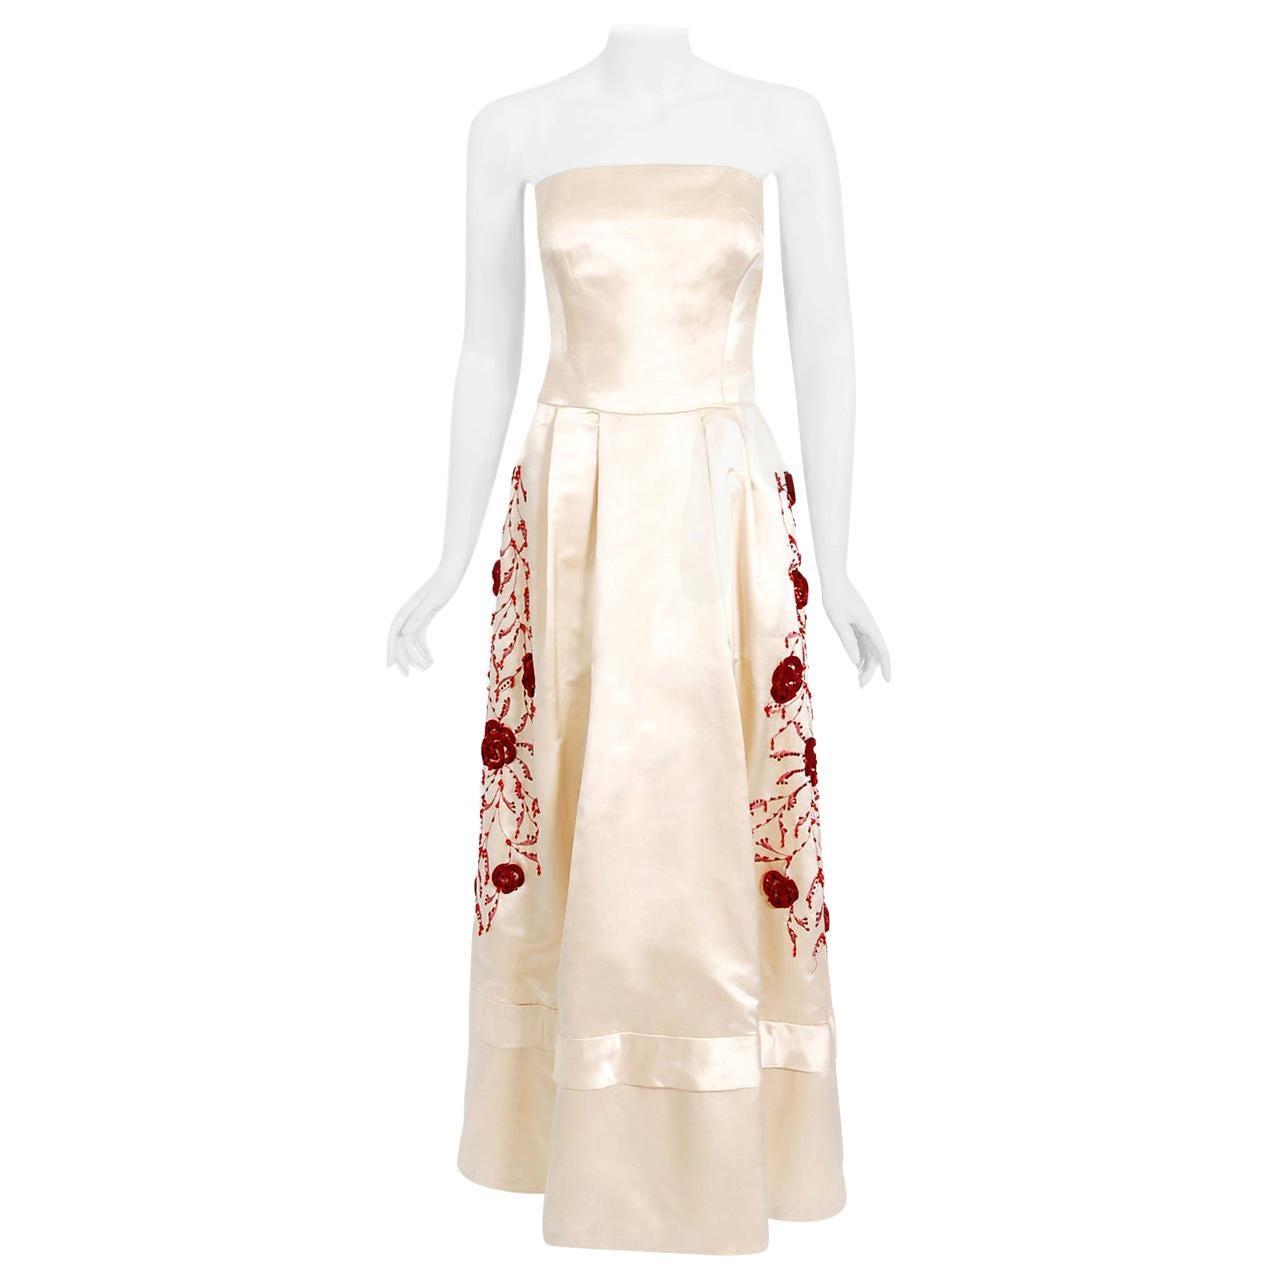 Vintage 1950's Harvey Berin Embroidered Floral Ivory Silk Strapless Bridal Dress